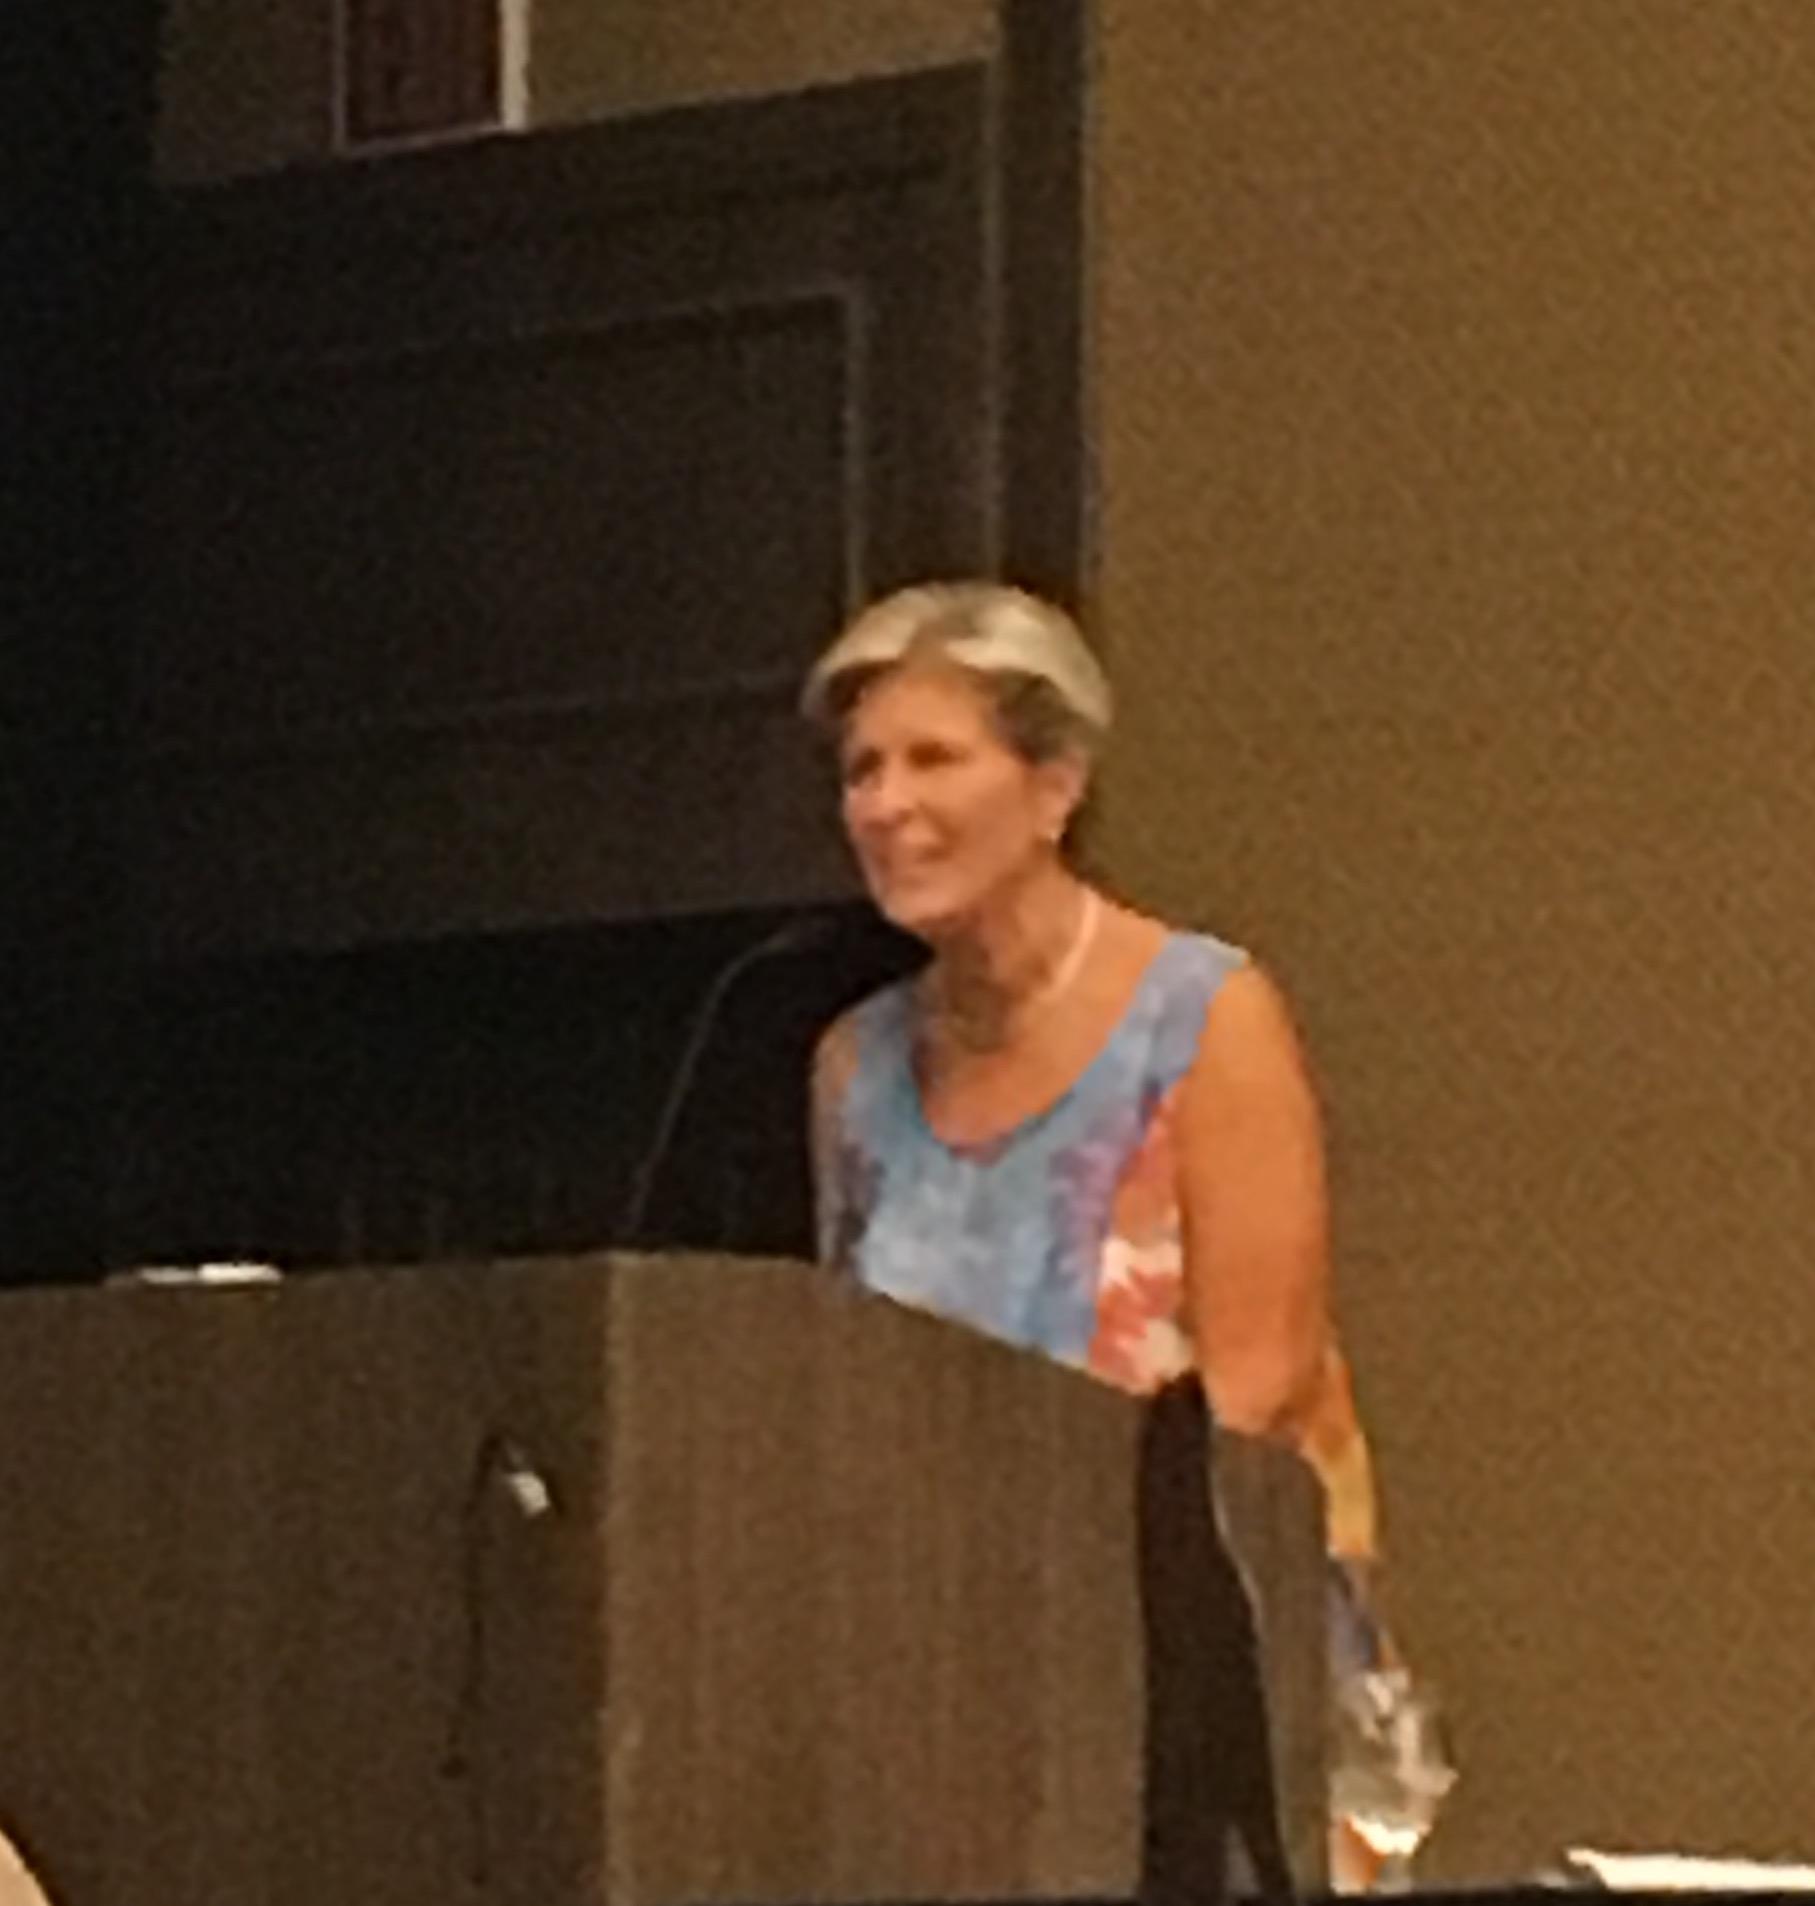 Ruth Ann Griggs, Intl. President